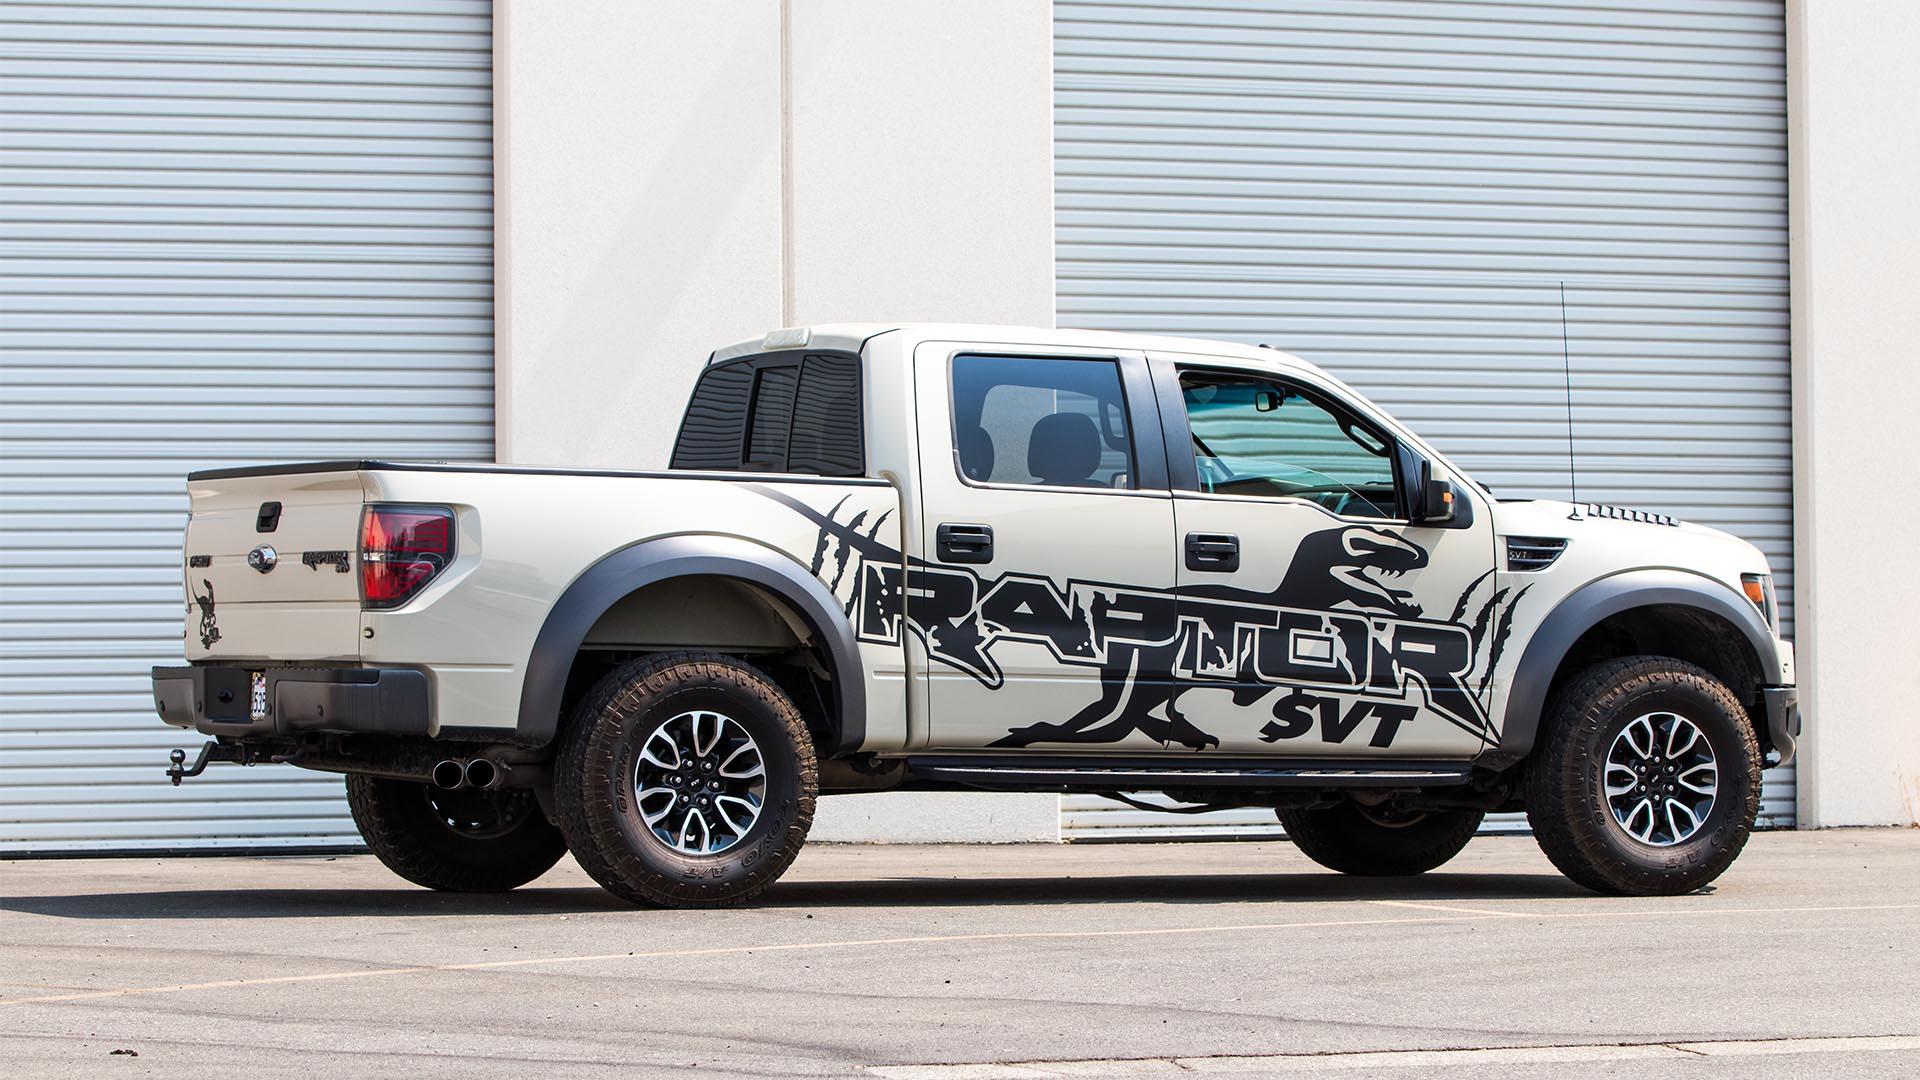 2014 Ford Raptor Quot Raptor Quot Decal Paint Wraps Palmer